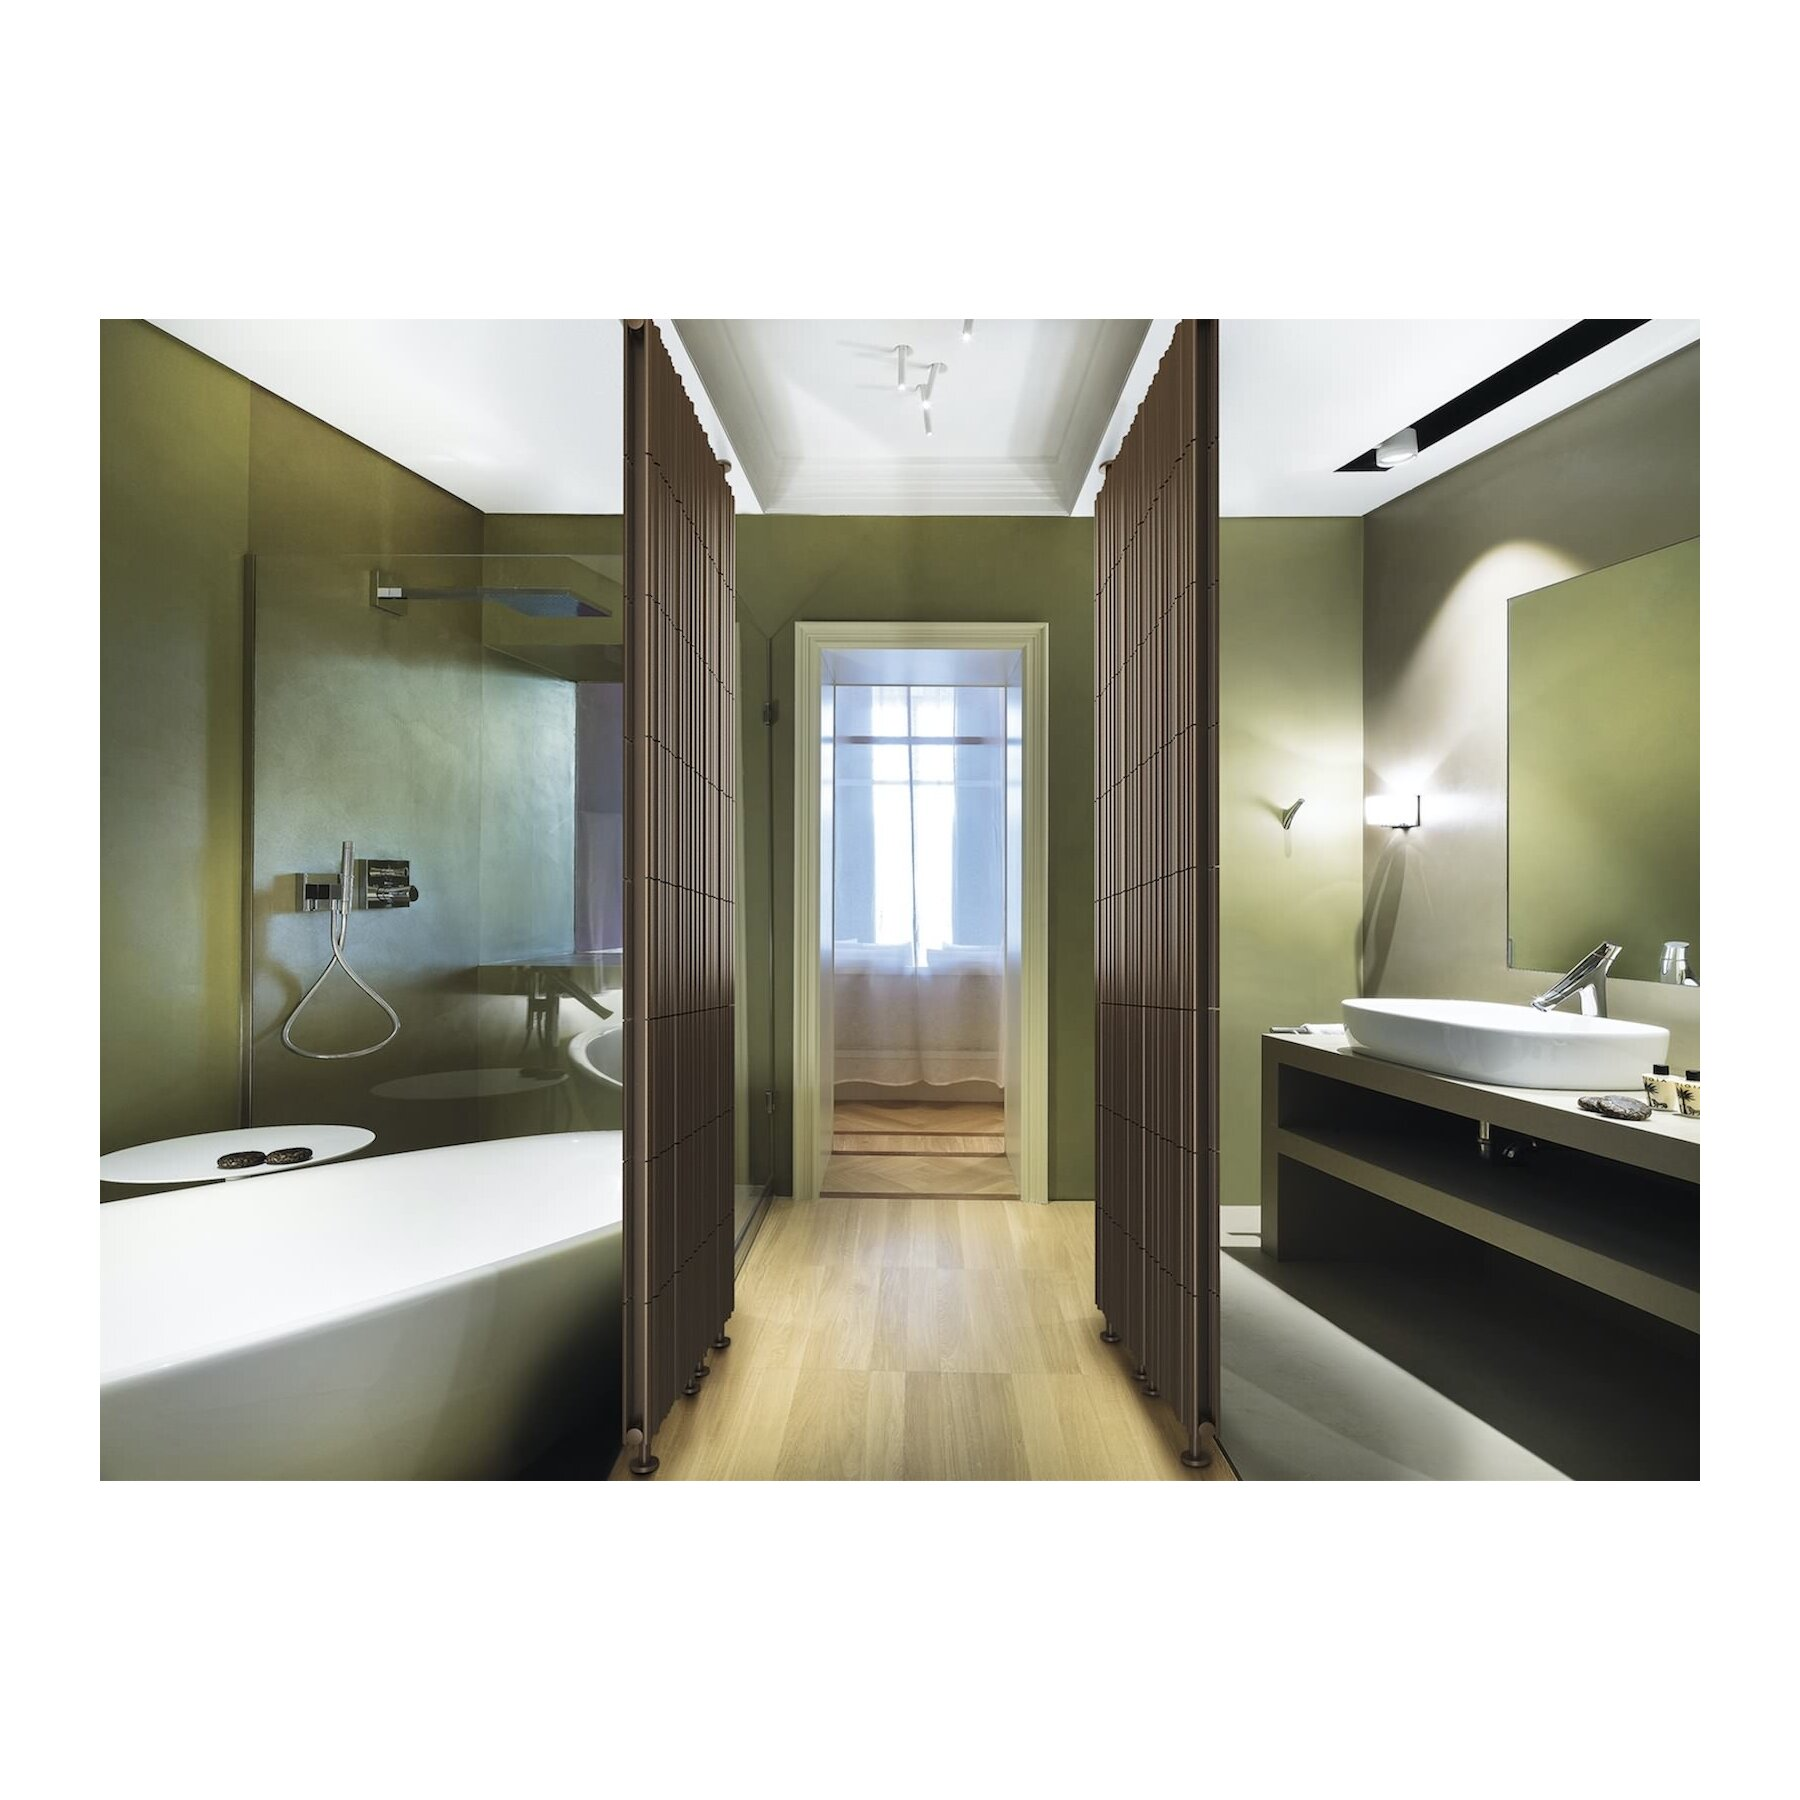 k8 radiatori freistehender designheizk rper. Black Bedroom Furniture Sets. Home Design Ideas